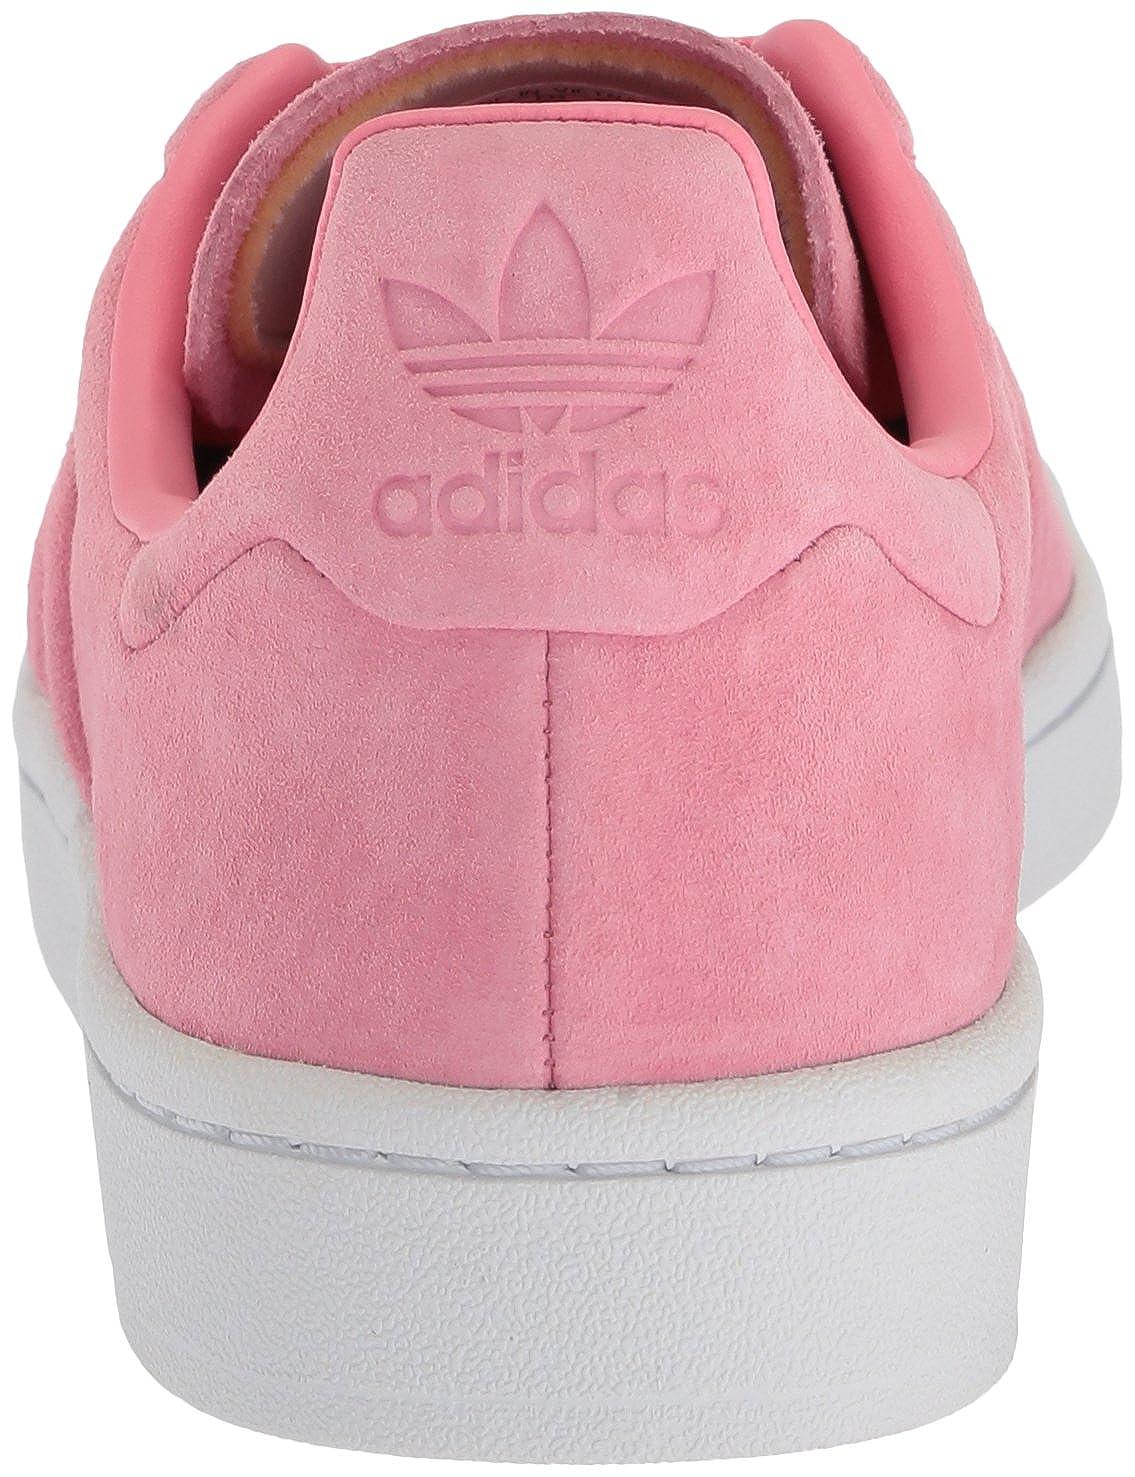 new arrival 02f92 e818c Amazon.com  adidas Originals Womens Campus Stitch and Turn W  Fashion  Sneakers